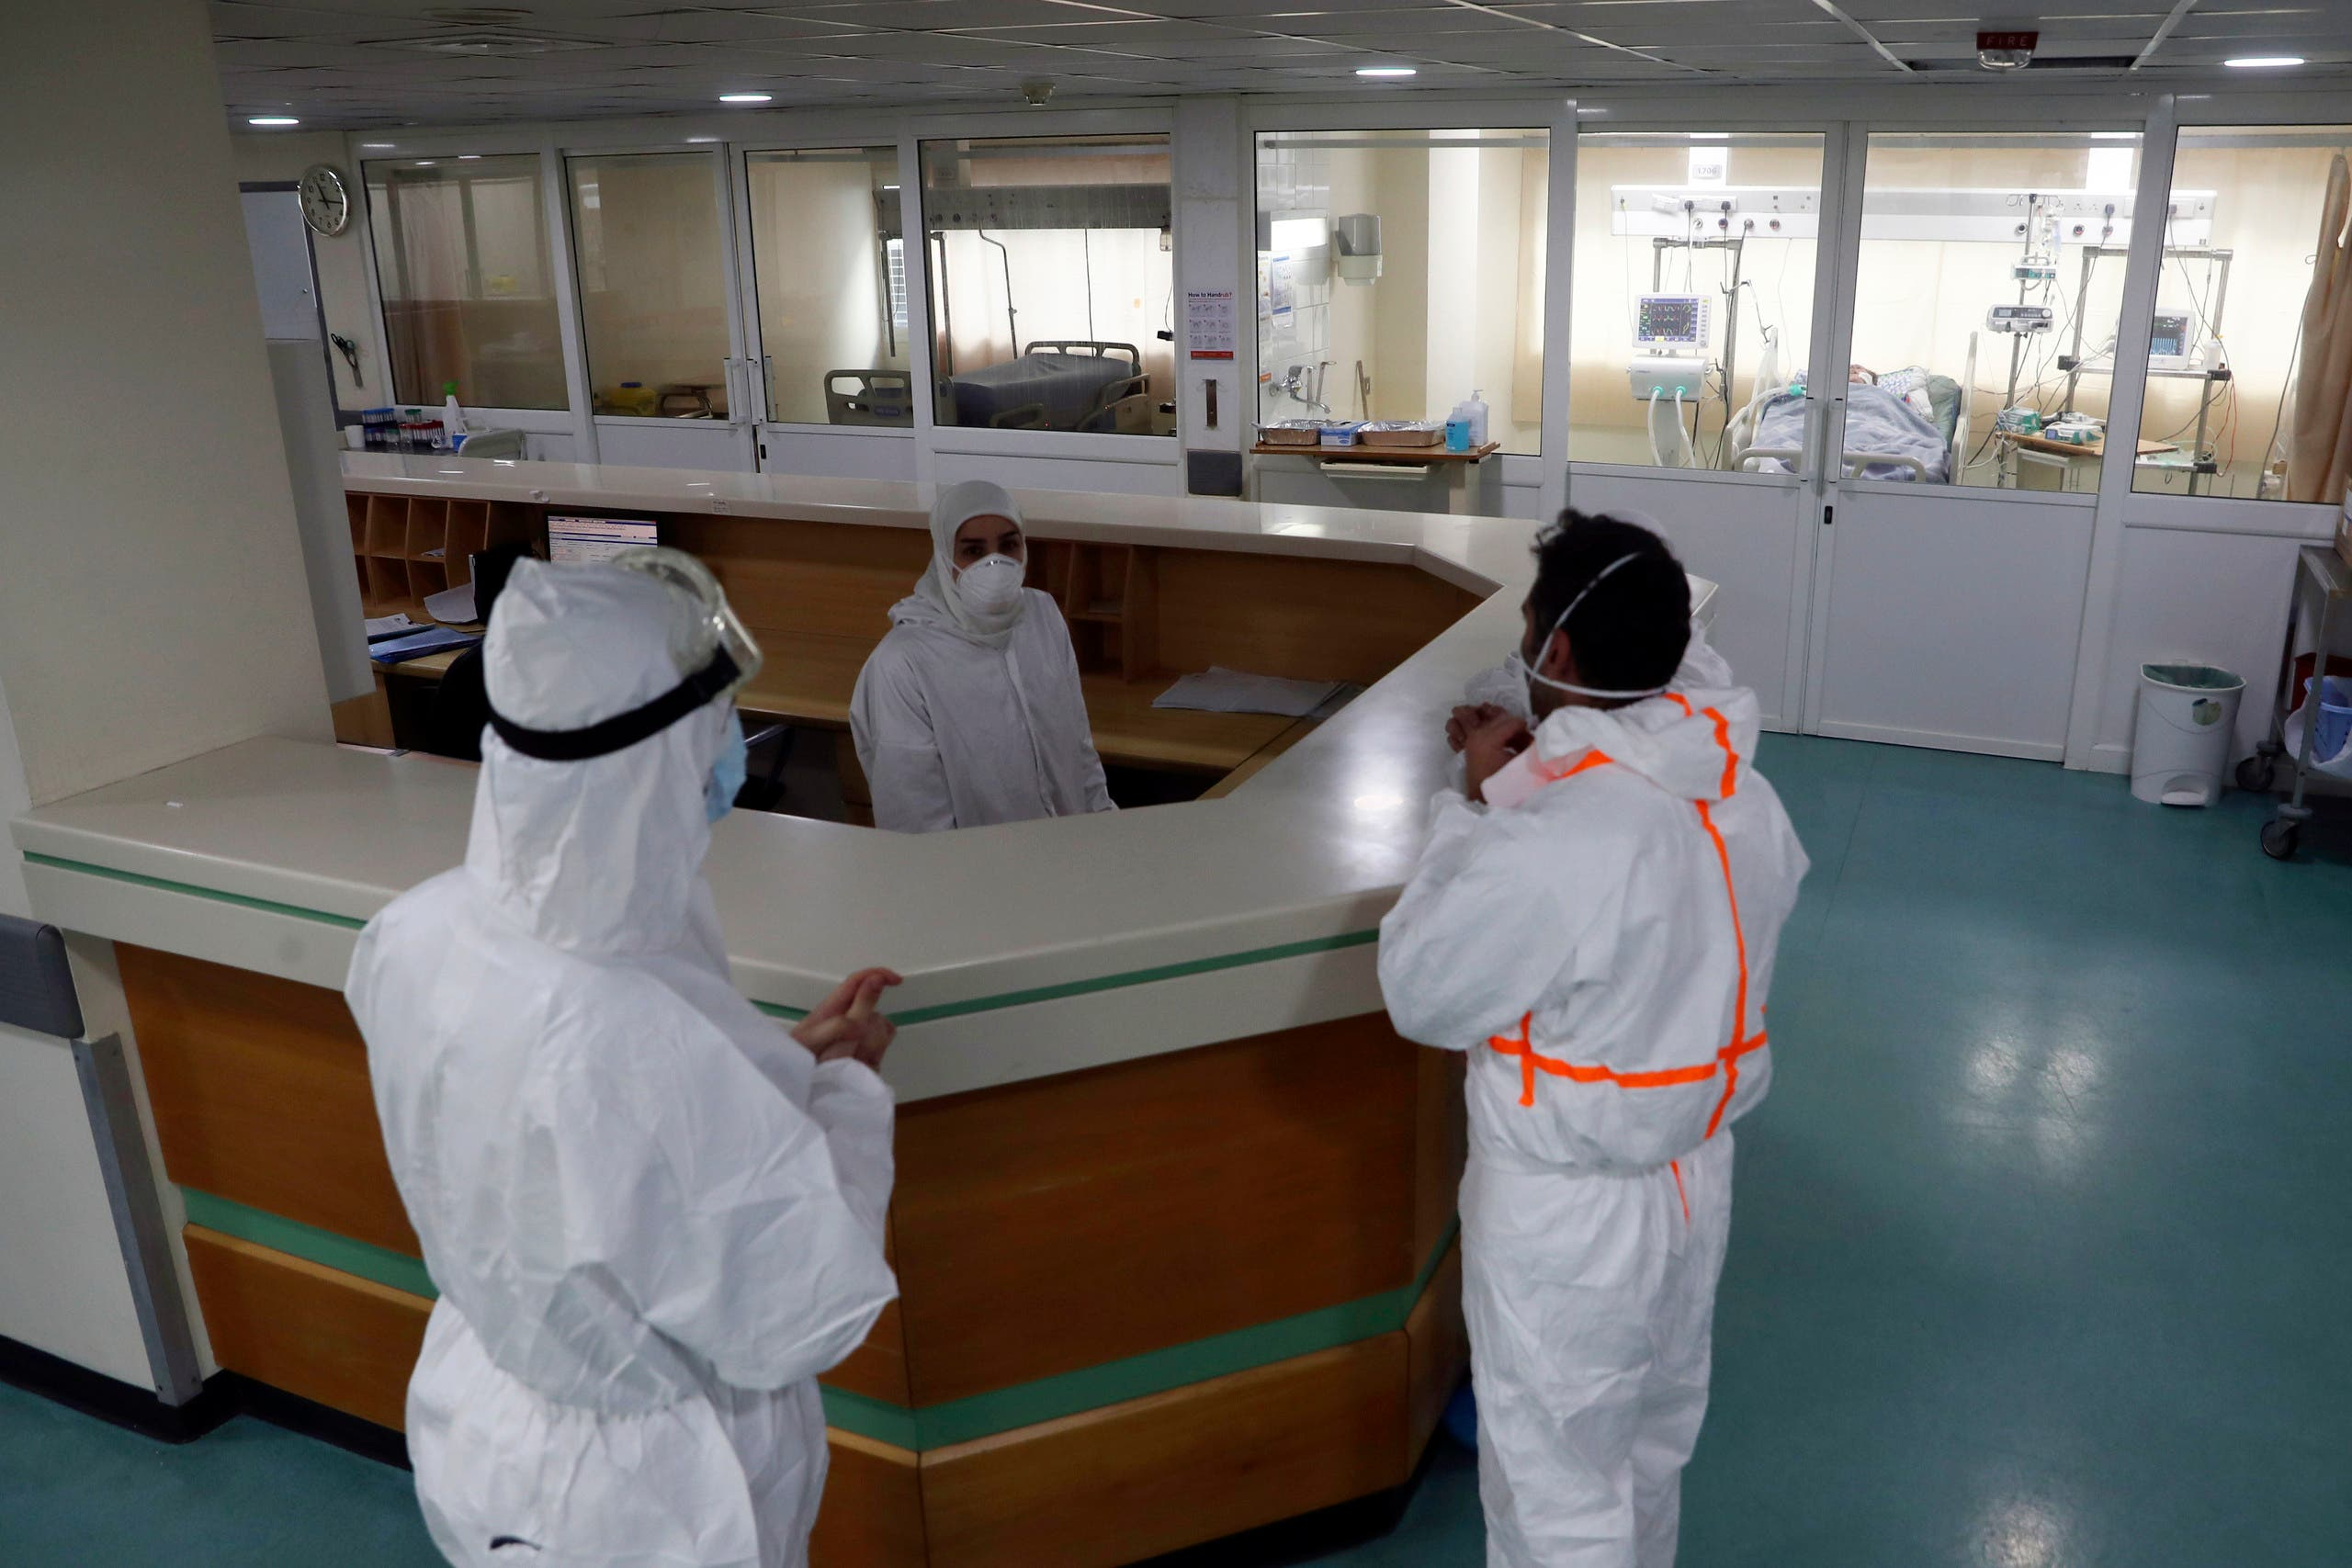 Medical staff stand at the intensive care unit of the Rafik Hariri University Hospital in Beirut, Lebanon. (AP)